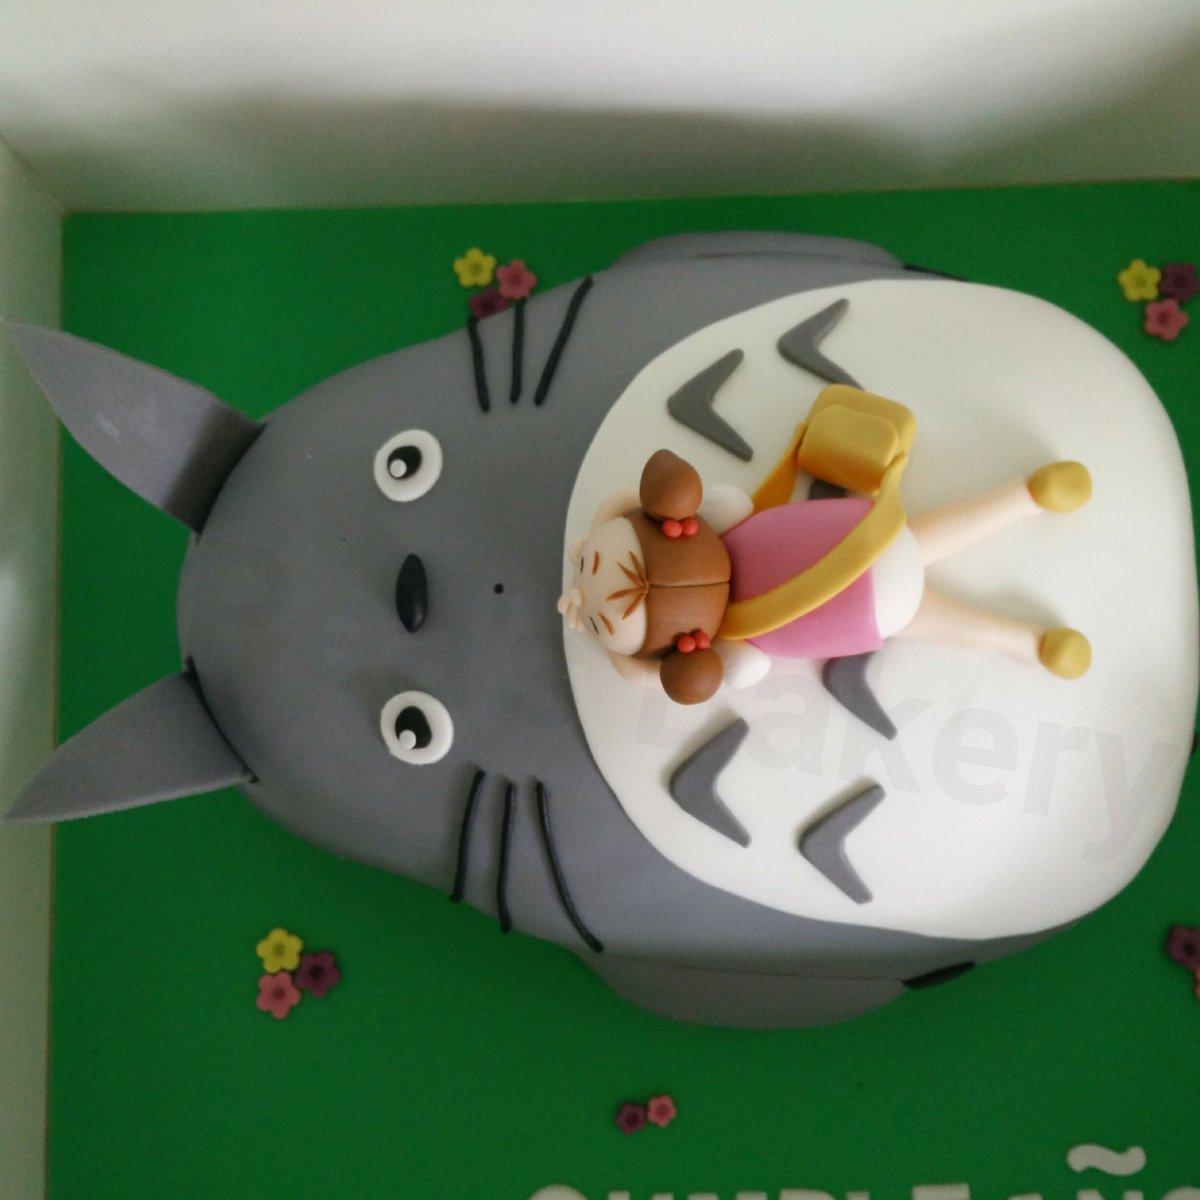 Sensational Peas Bakery On Twitter Totoro Vanilla Flavoured Birthday Cake Funny Birthday Cards Online Aeocydamsfinfo